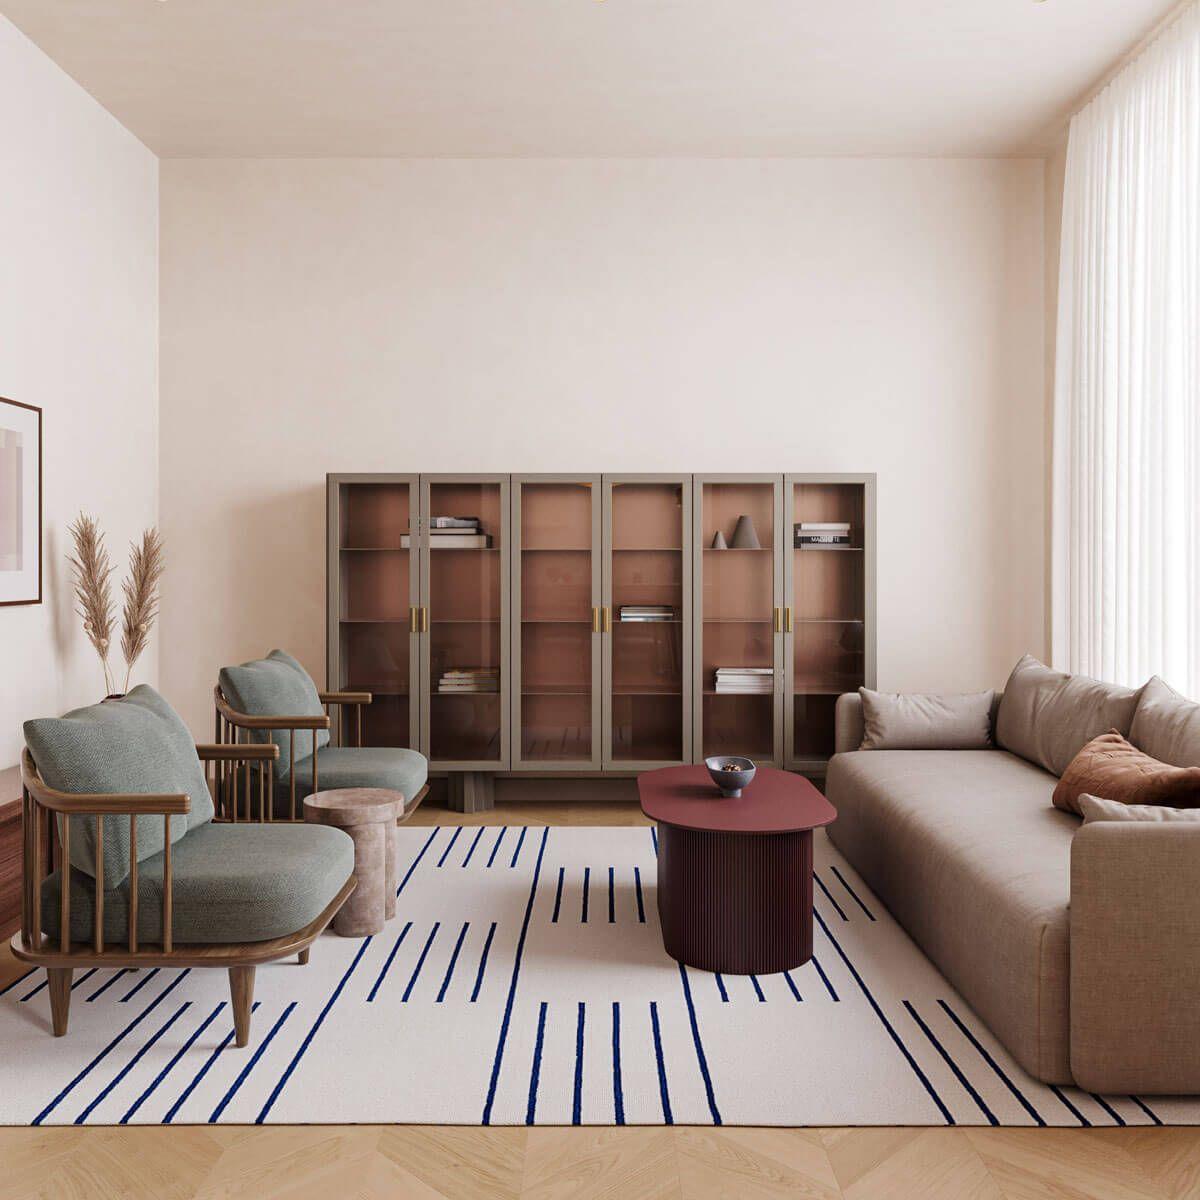 Classic Cream Blue Nordic Knots In 2020 Architect Office Interior Modern Interior Design Nordic Interior Design